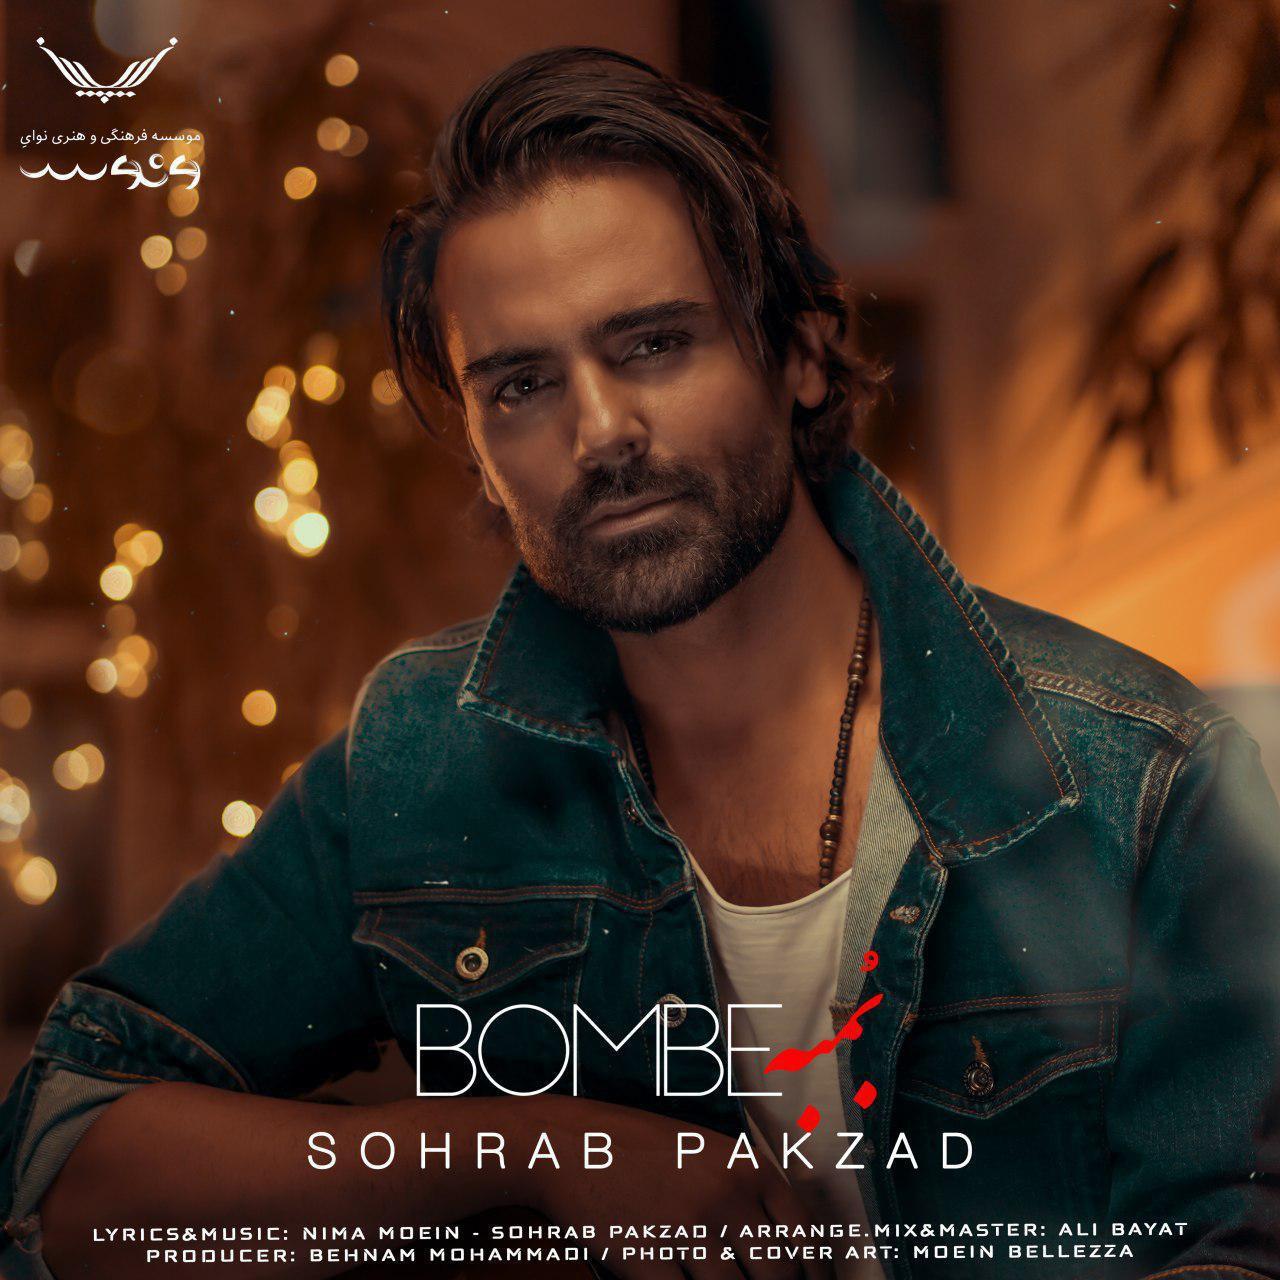 Sohrab Pakzad - Bombe - دانلود آهنگ سهراب پاکزاد به نام بمبه